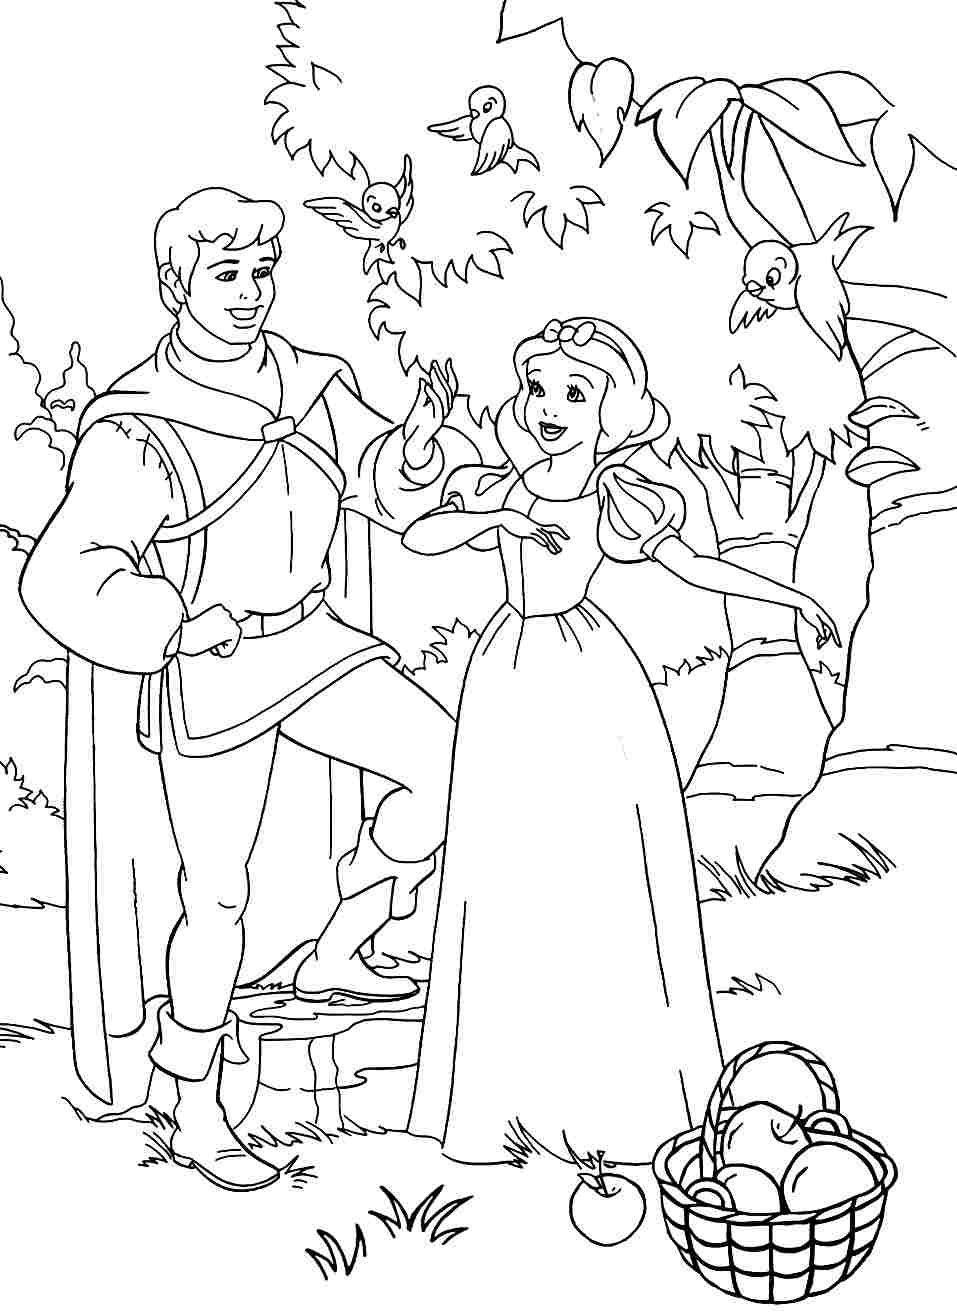 colouring sheets disney princess snow